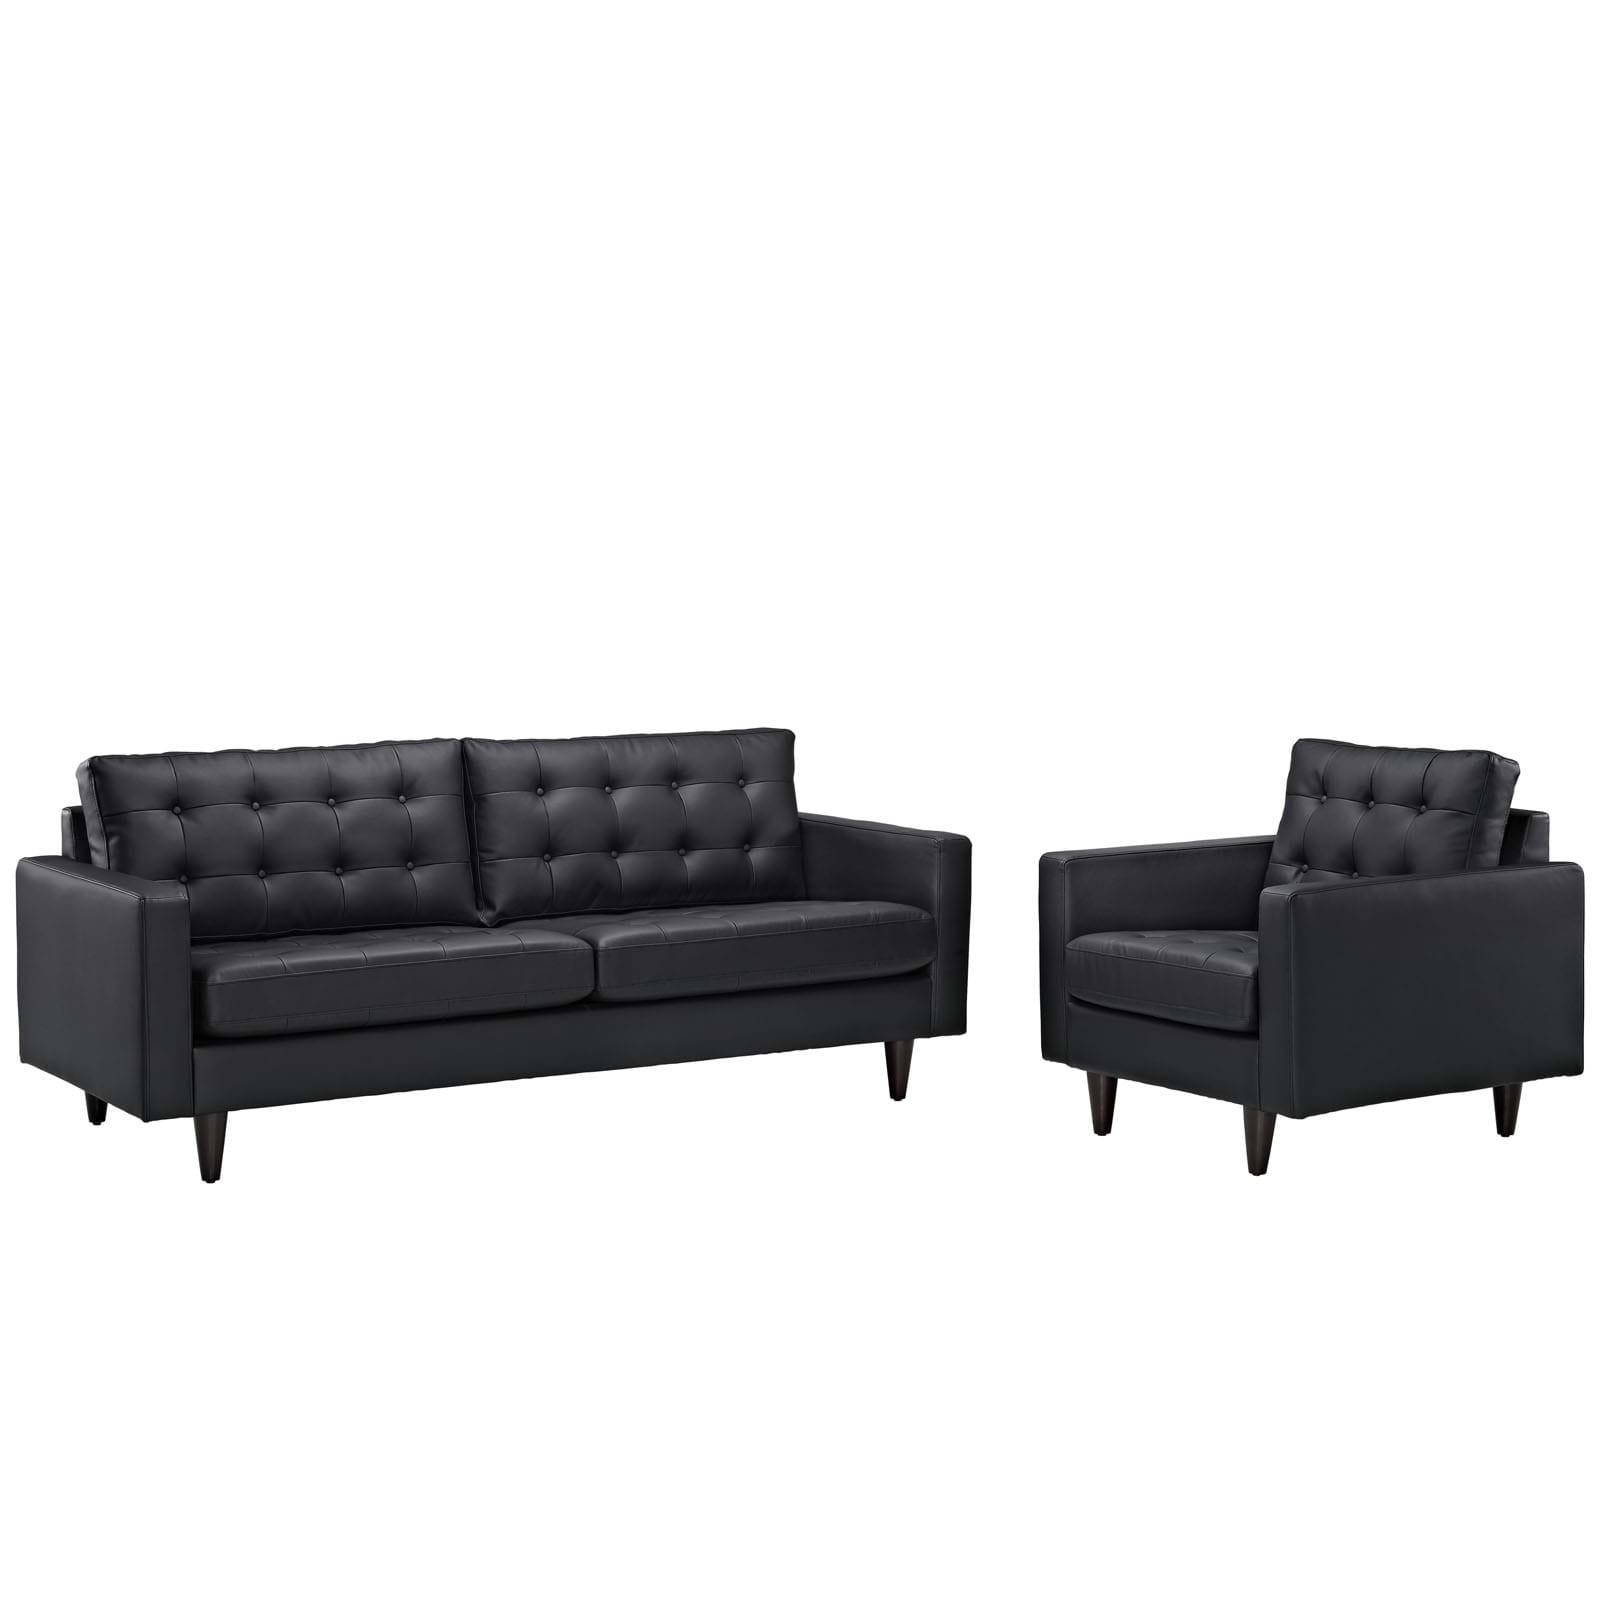 Empress Sofa and Armchair Set of 2